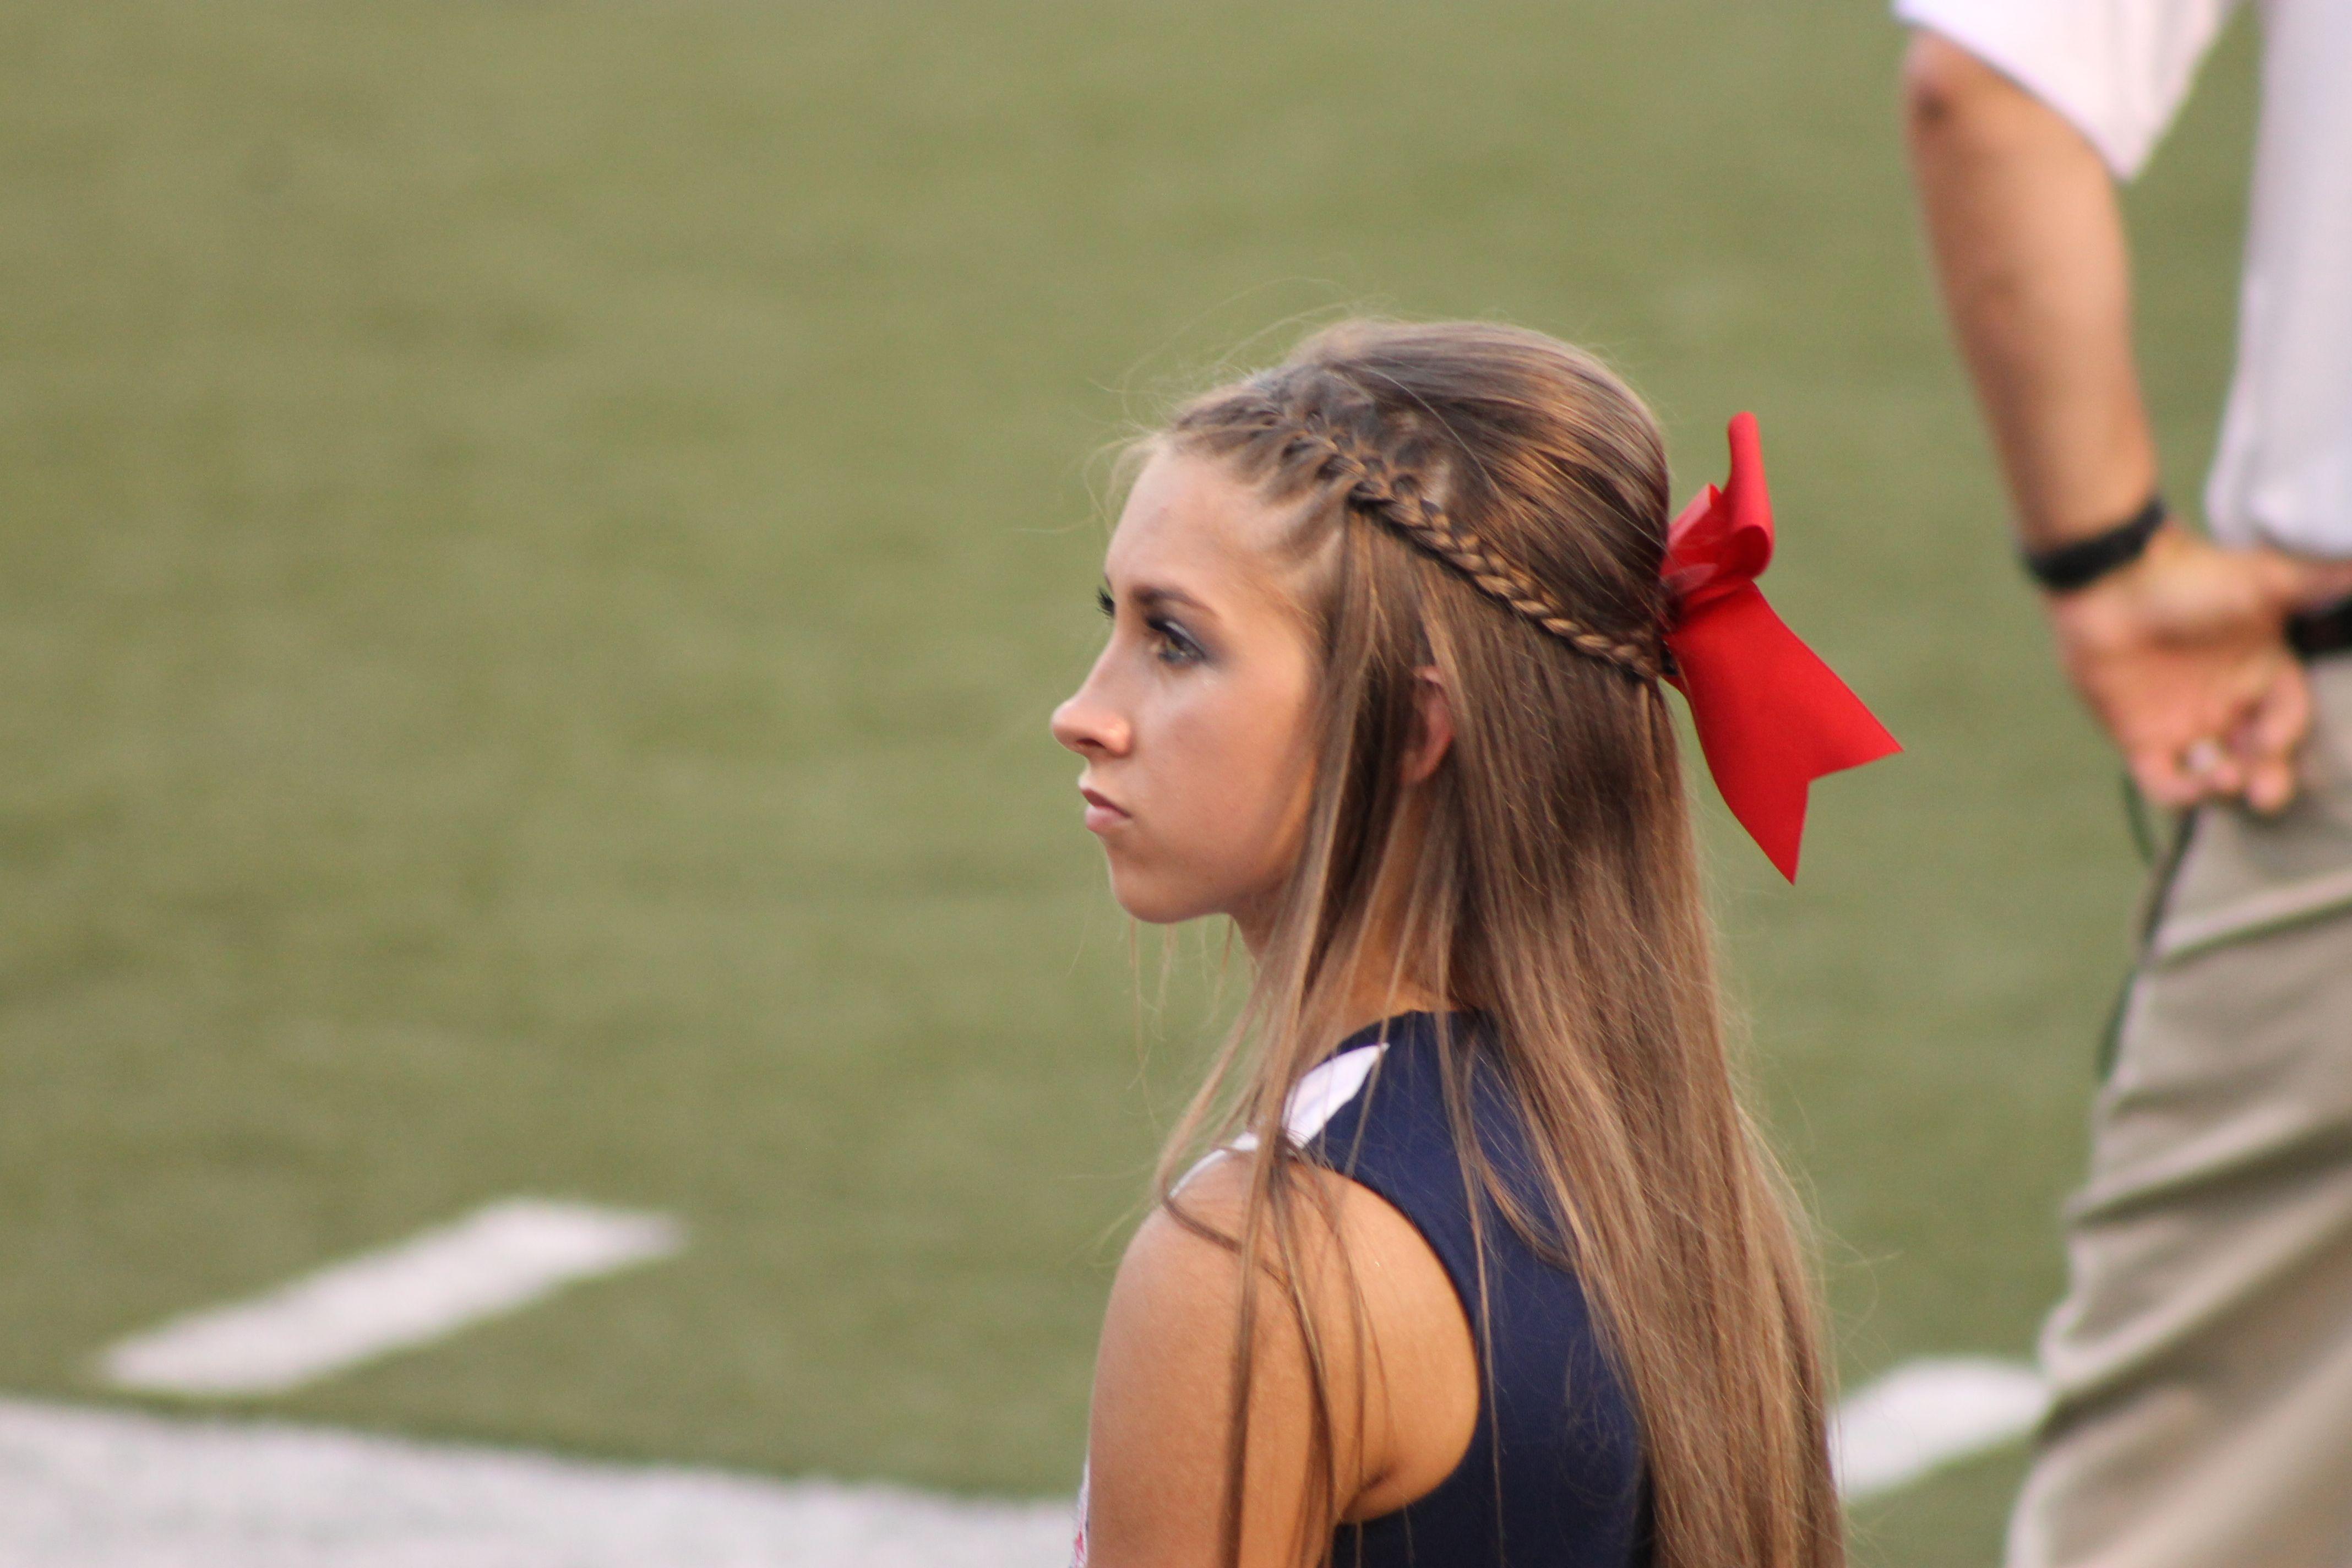 Cheer hair for the cheer season so perfect my favorite hair style